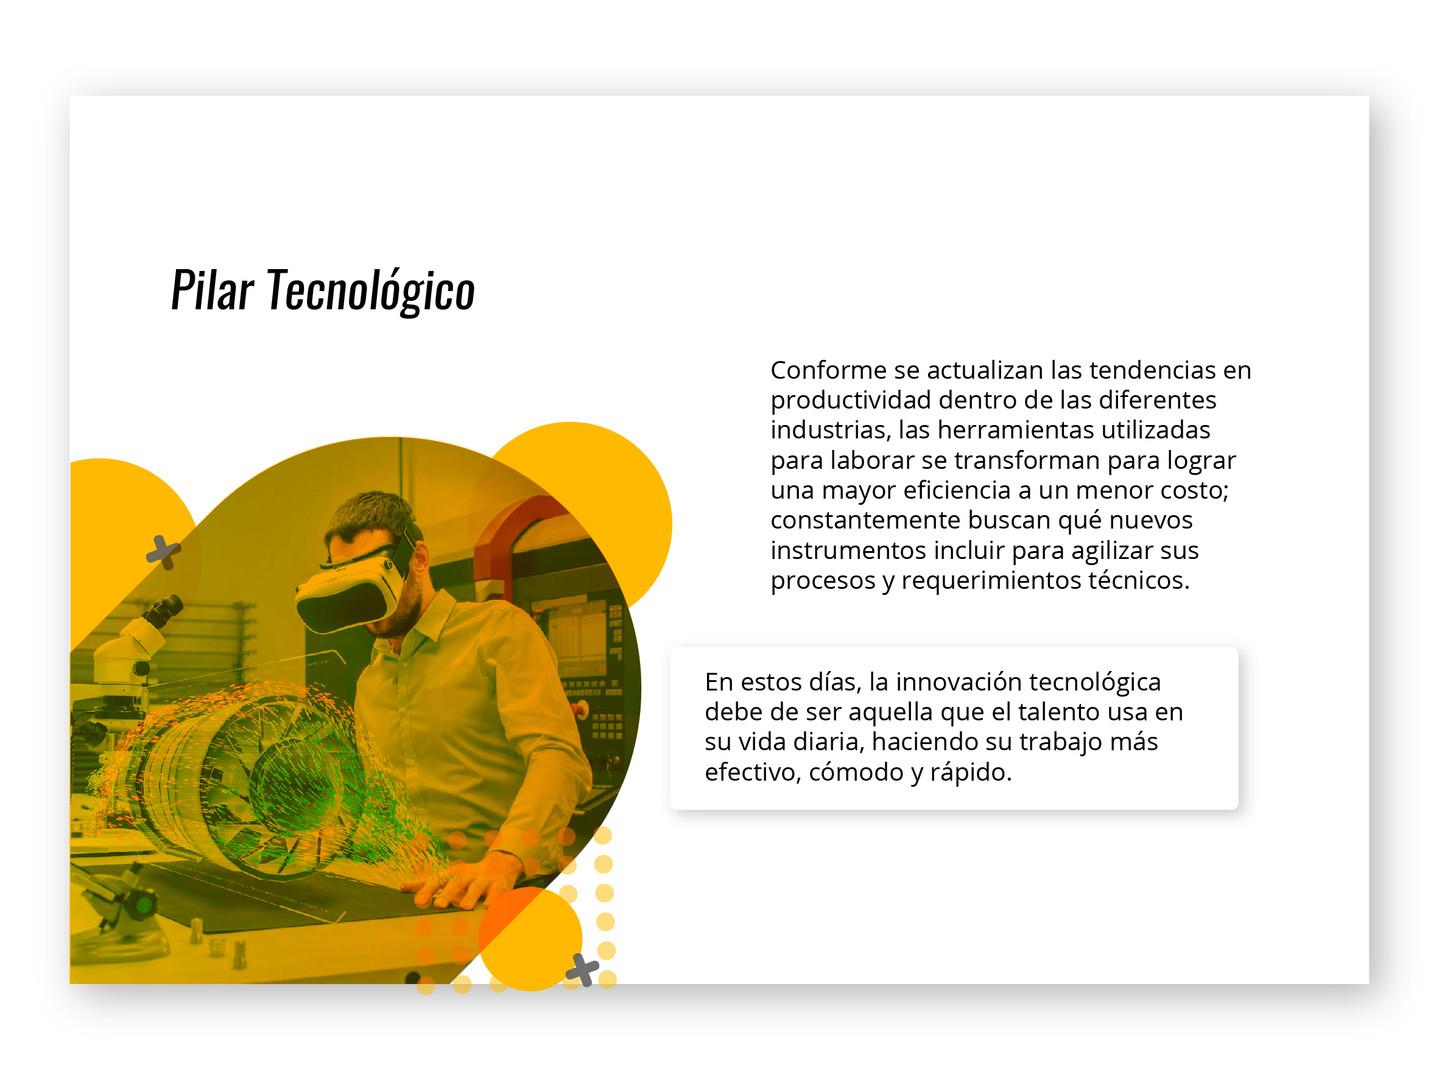 Pilar_Tecnológico.jpg